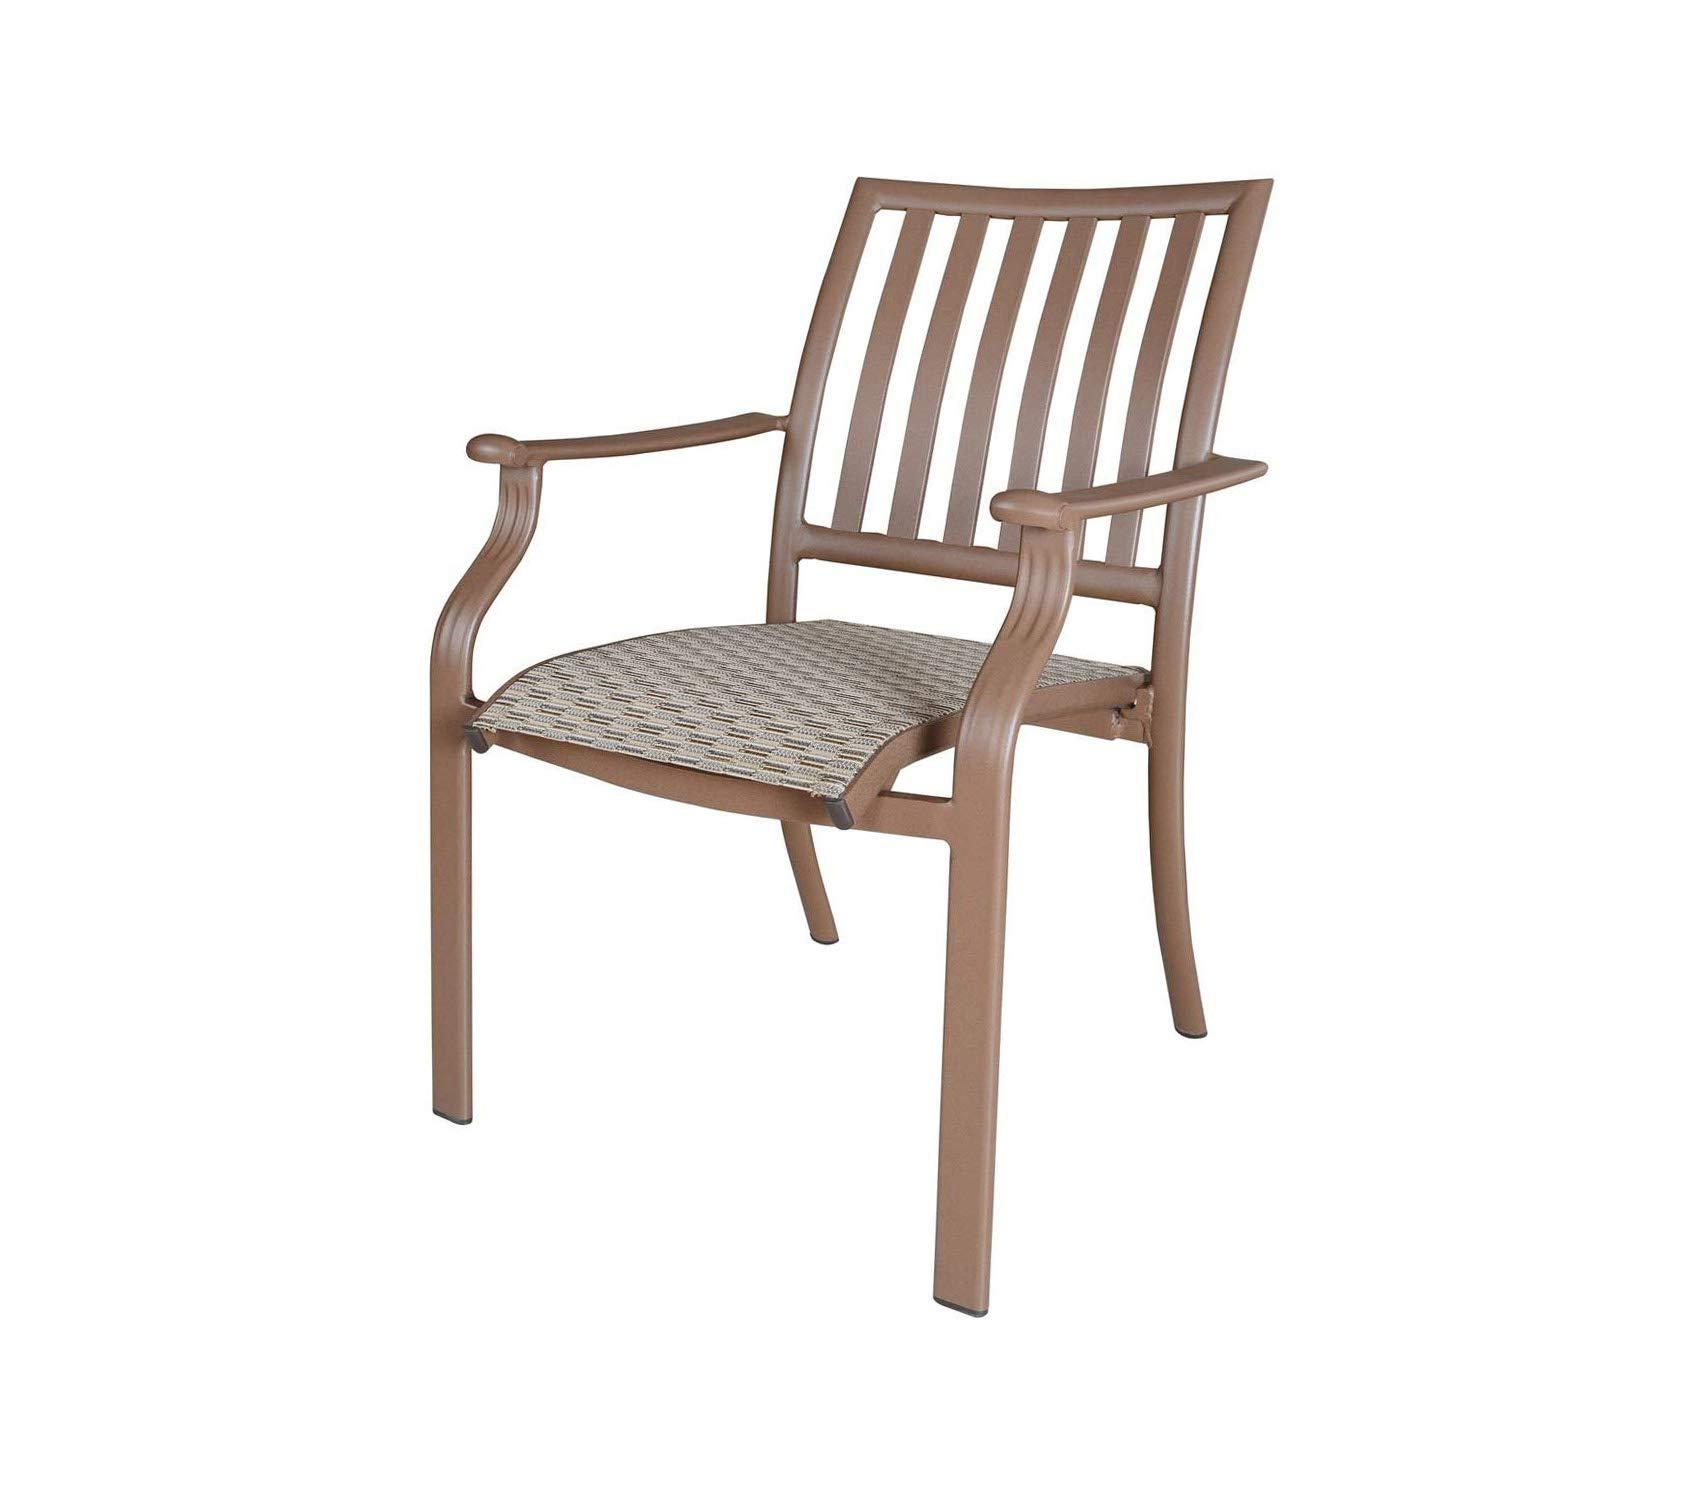 Pаnаmа Jаck Оutdооr Patio Outdoor Garden Premium Stackable Sling Arm Chair, Espresso Finish